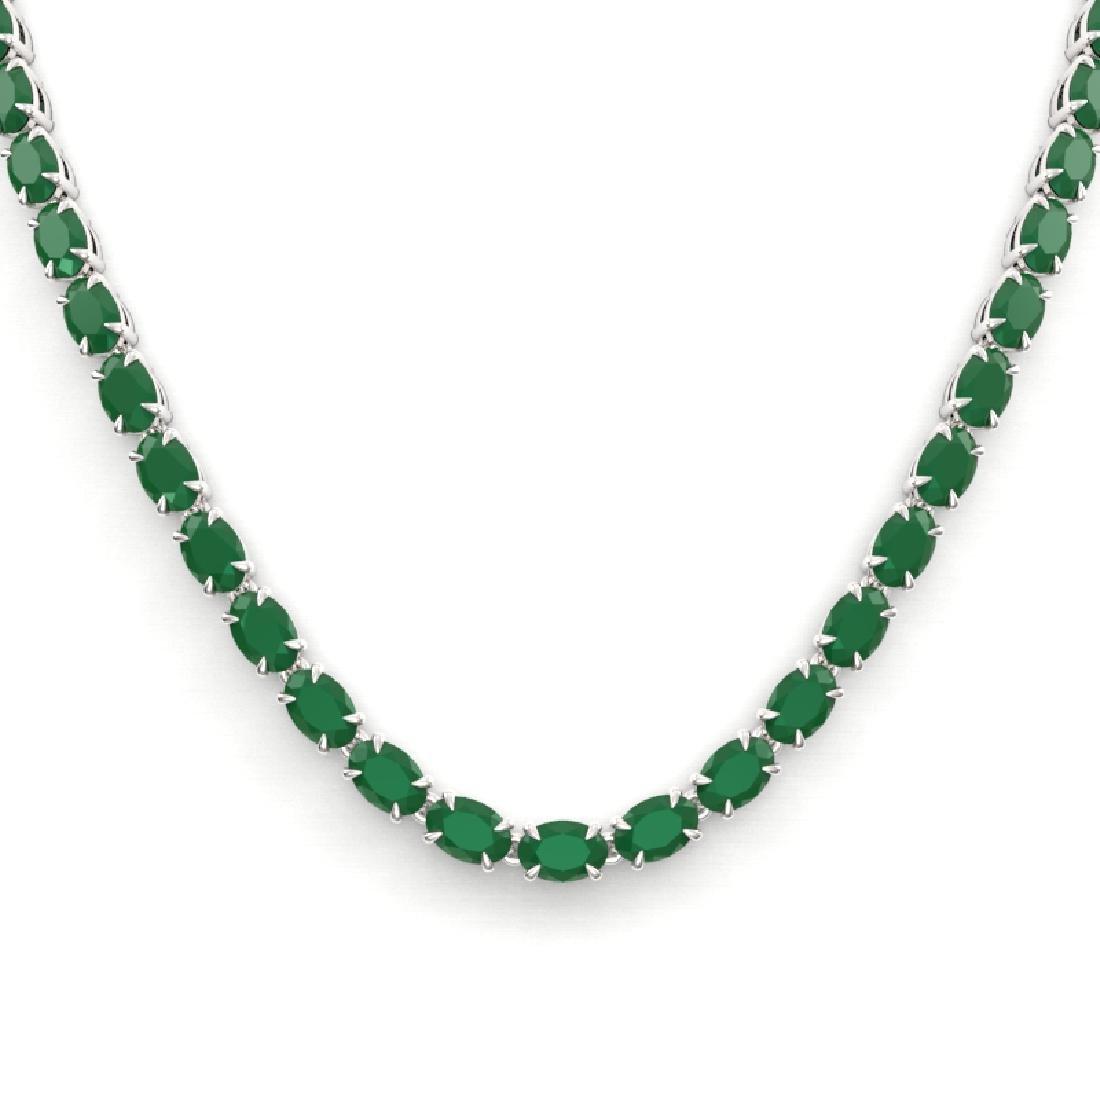 40 CTW Emerald Eternity Tennis Necklace 14K White Gold - 2